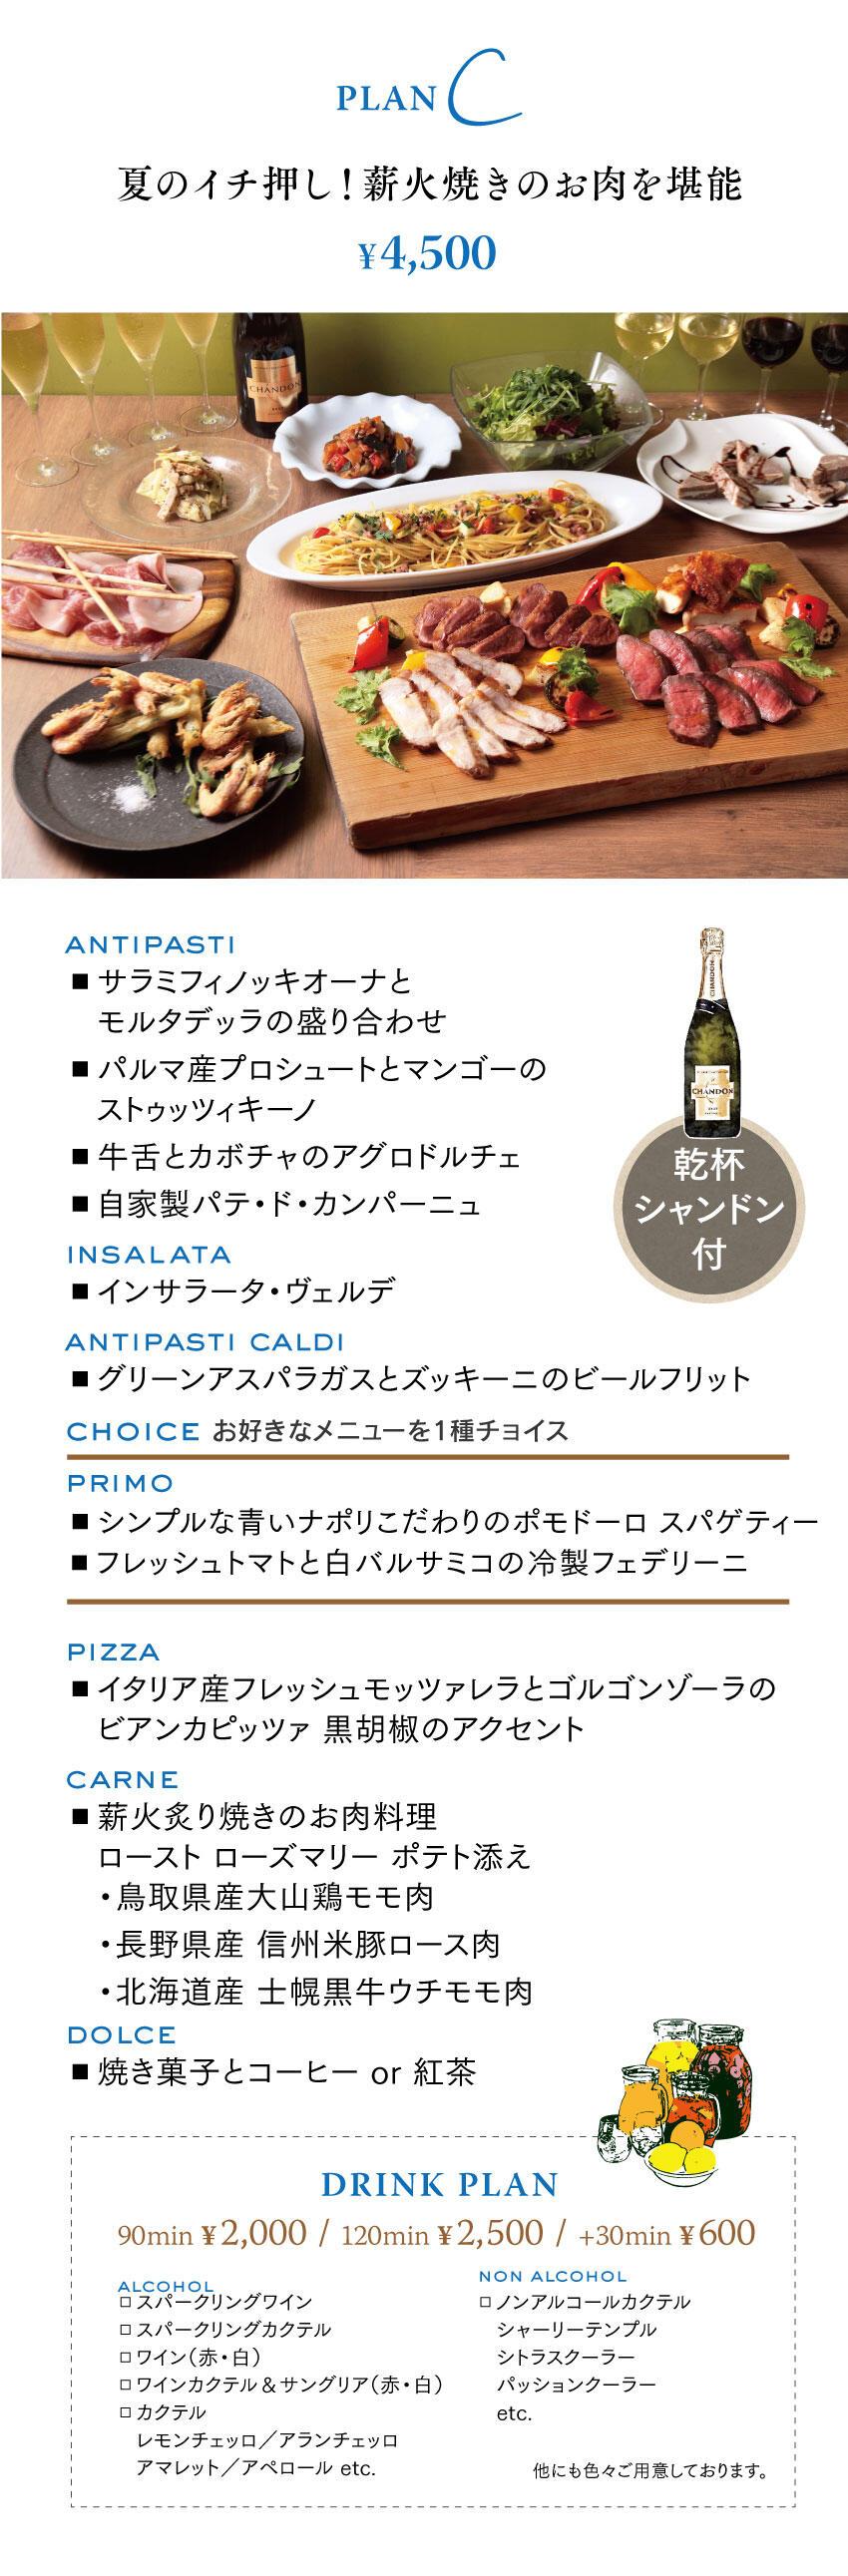 aoi_plan2007_c.jpg